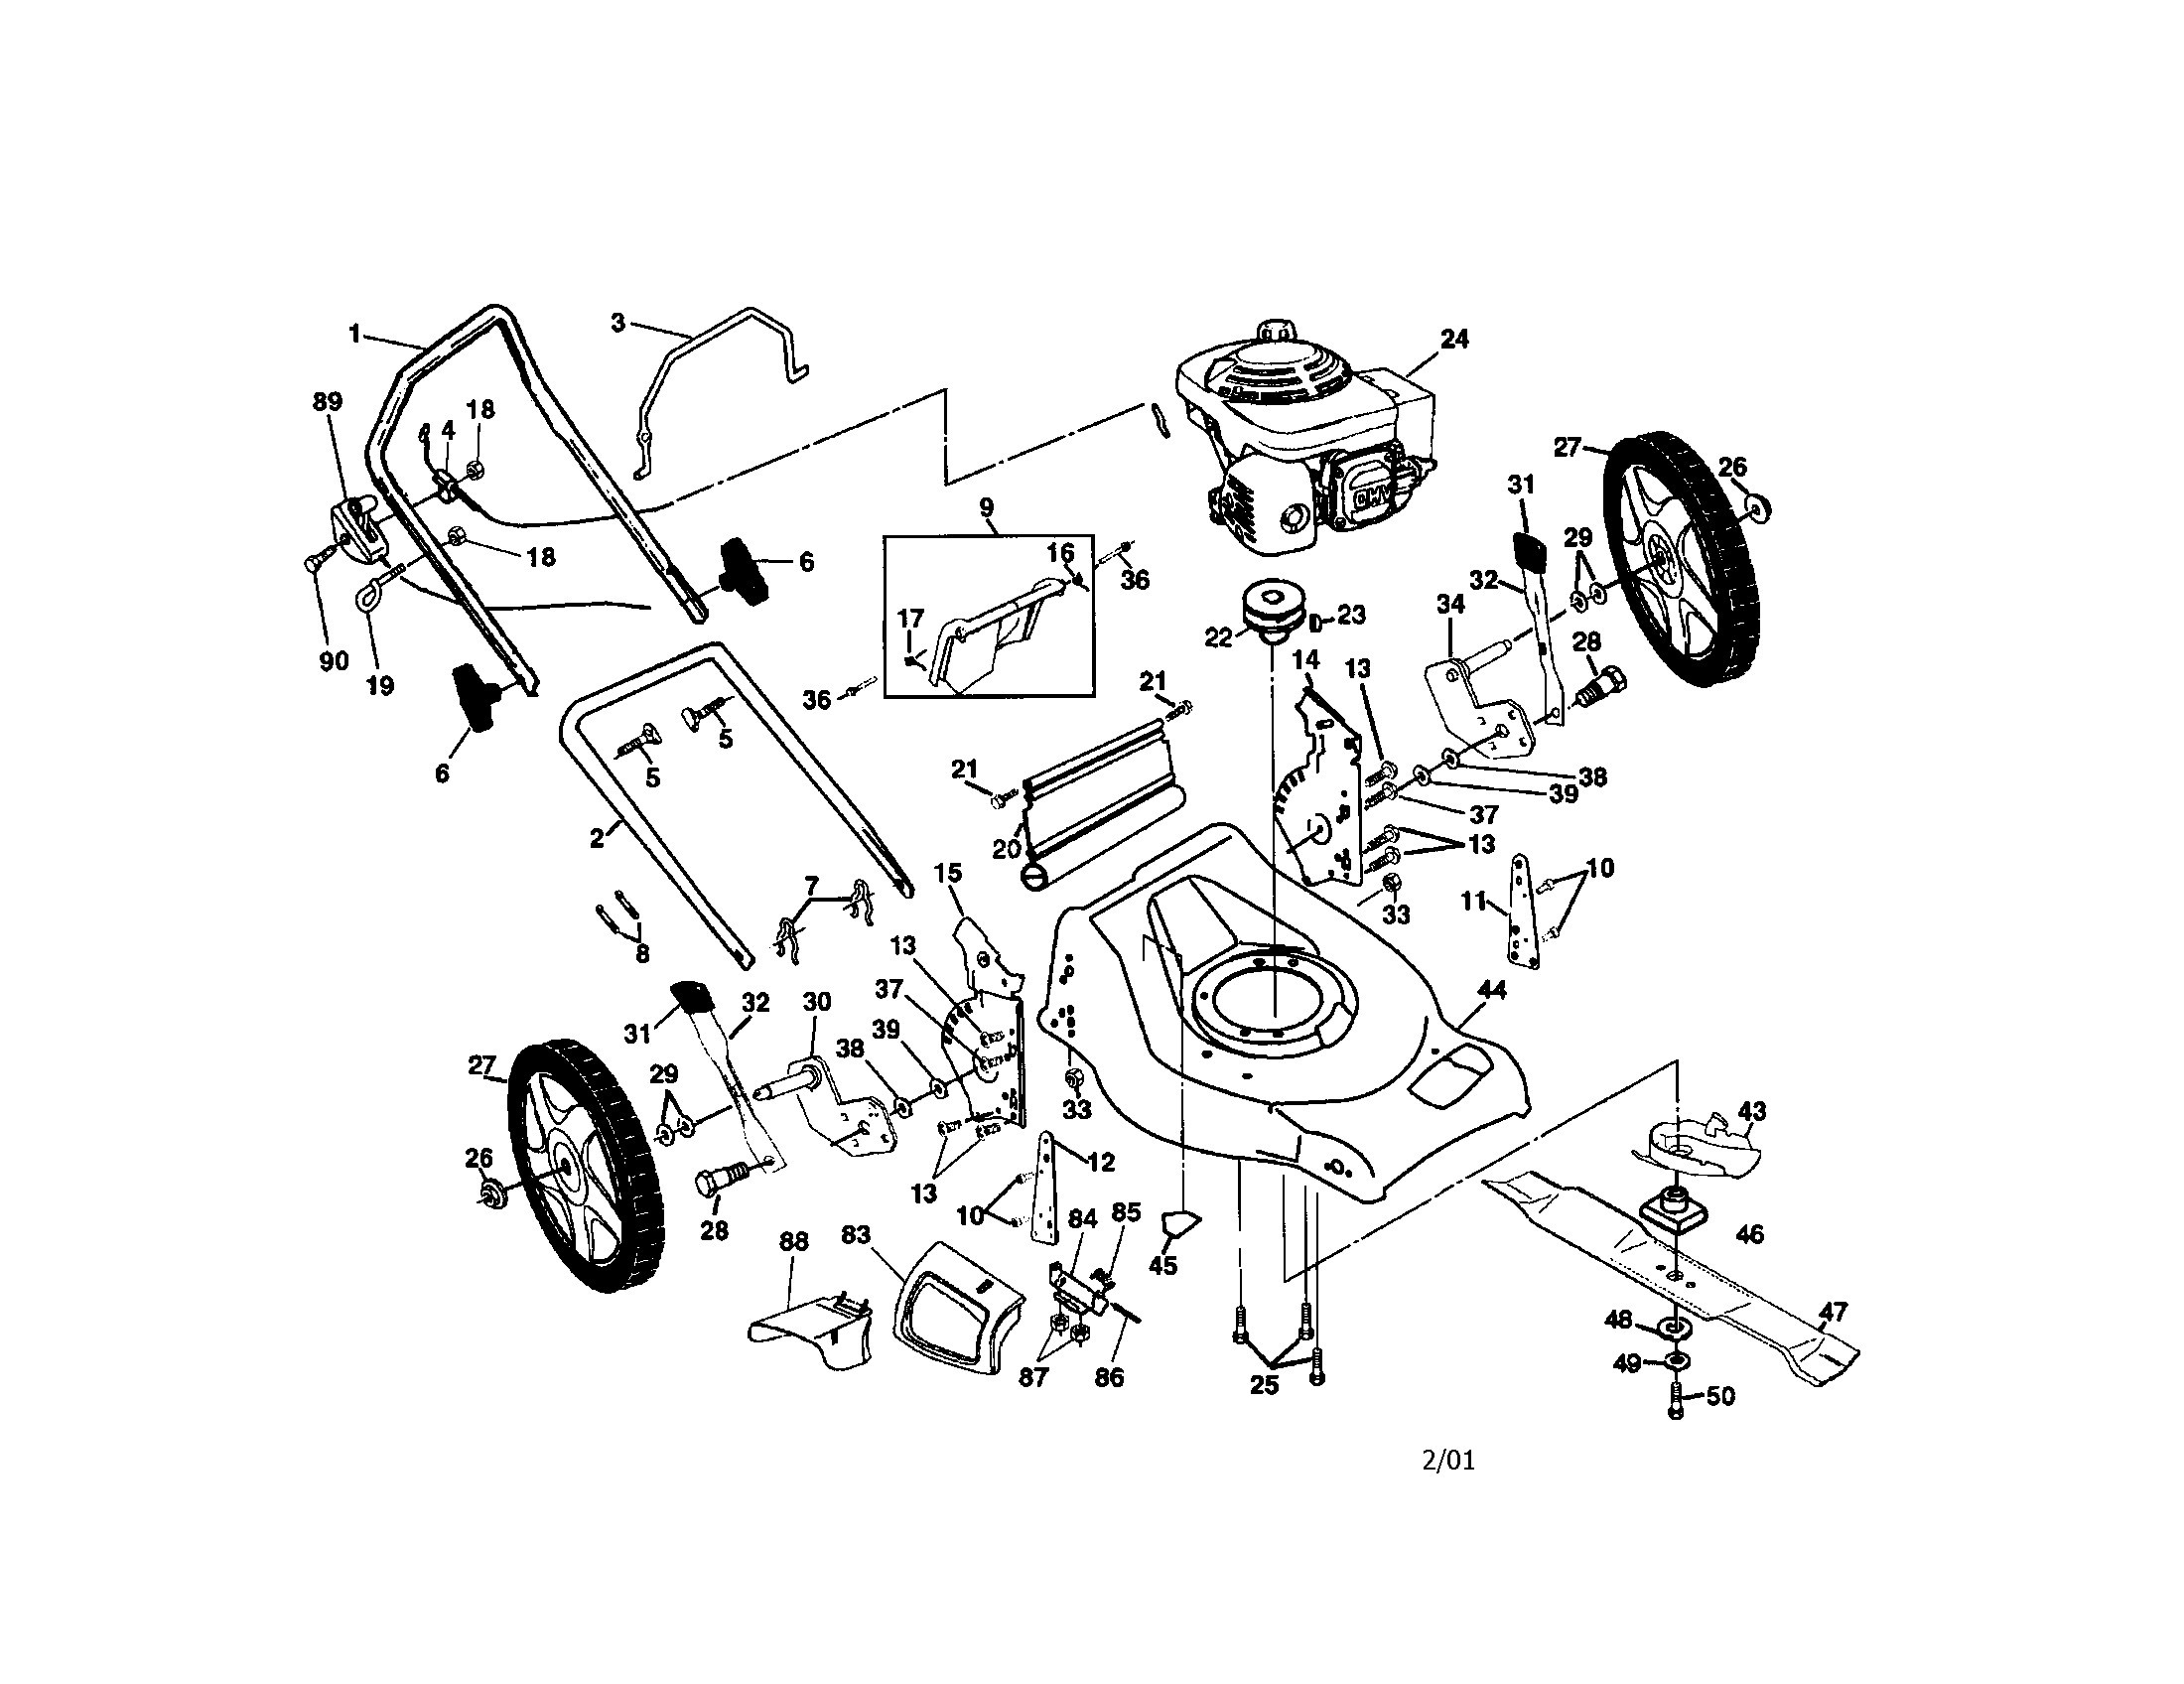 Honda Gcv160 Engine Parts Diagram Honda Gc160 Parts Diagram Engine Honda Gcv160 as3h2 5 5h – My Wiring Of Honda Gcv160 Engine Parts Diagram